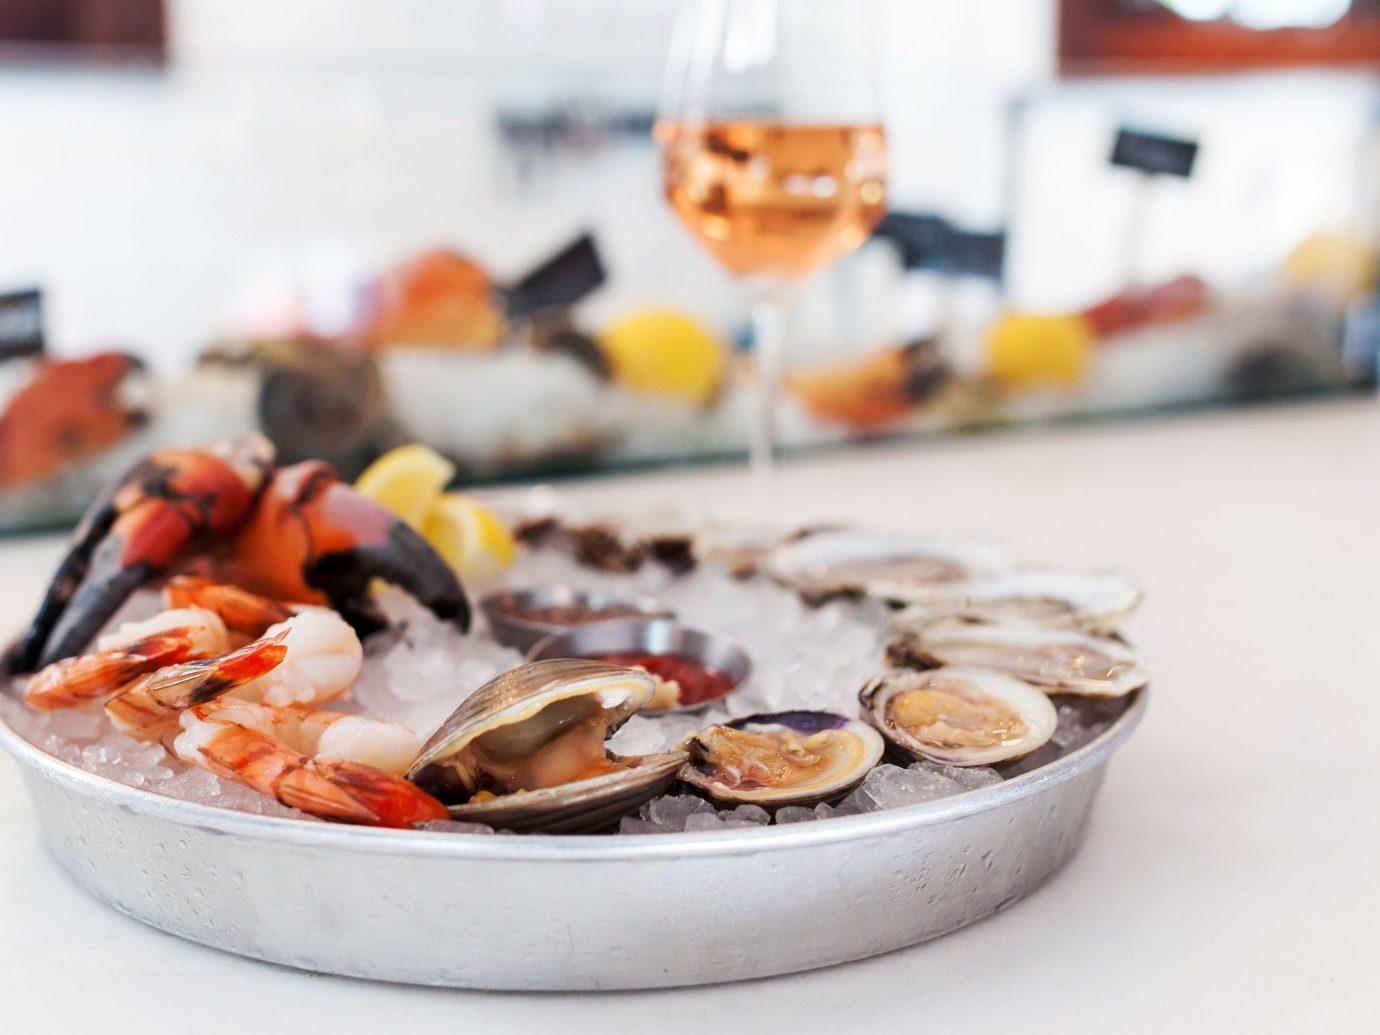 Trip Ideas dish food plate sushi meal breakfast cuisine Seafood sense brunch mussel